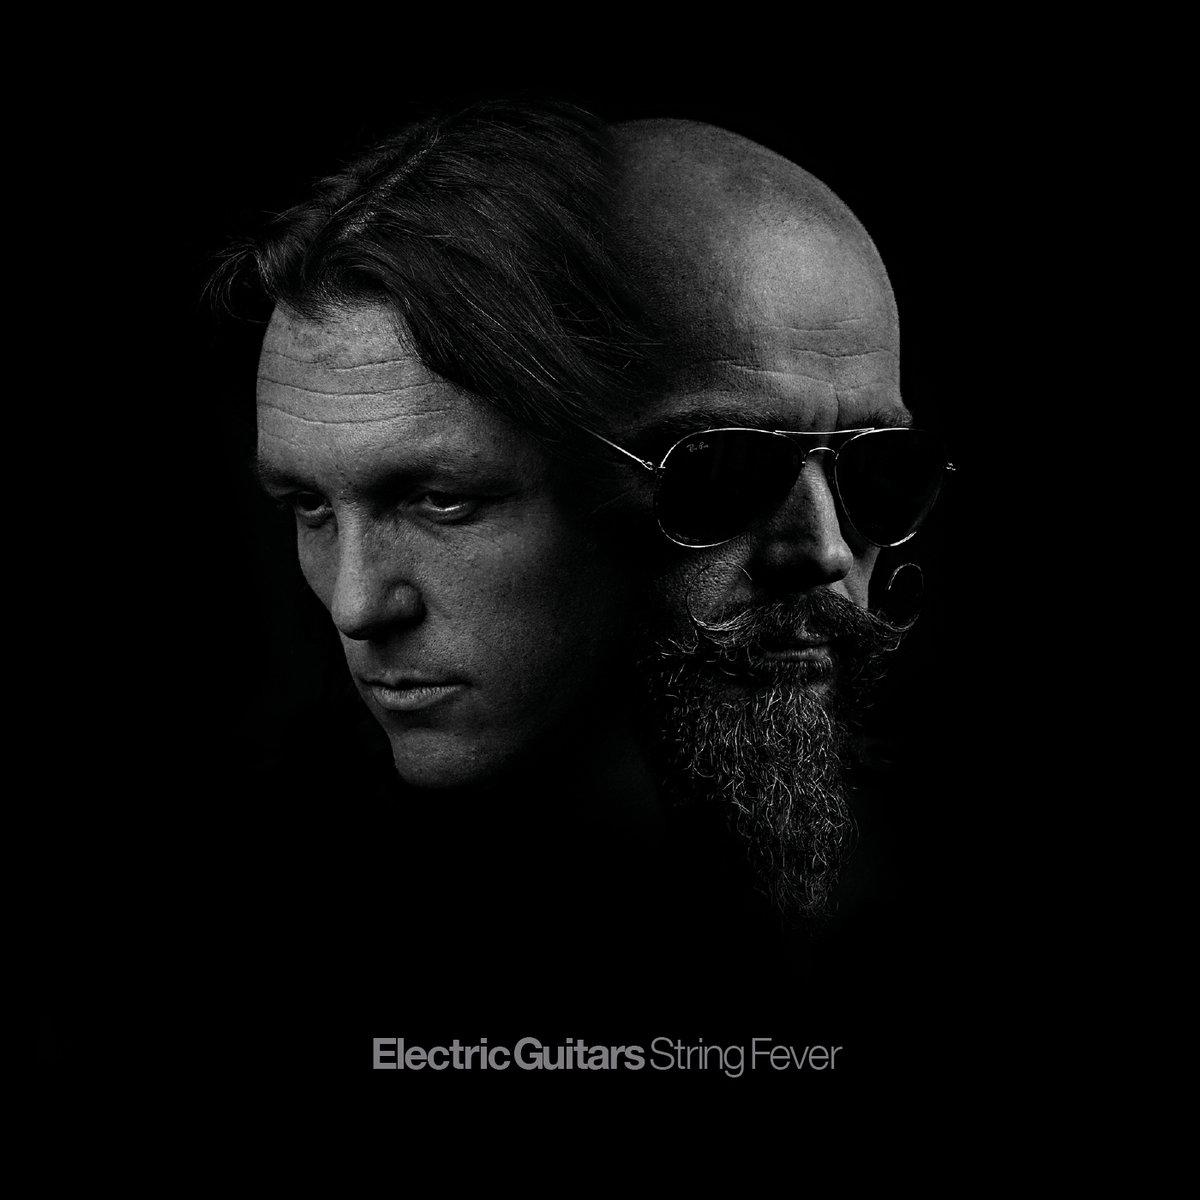 stark music reviews electric guitars string fever cd. Black Bedroom Furniture Sets. Home Design Ideas